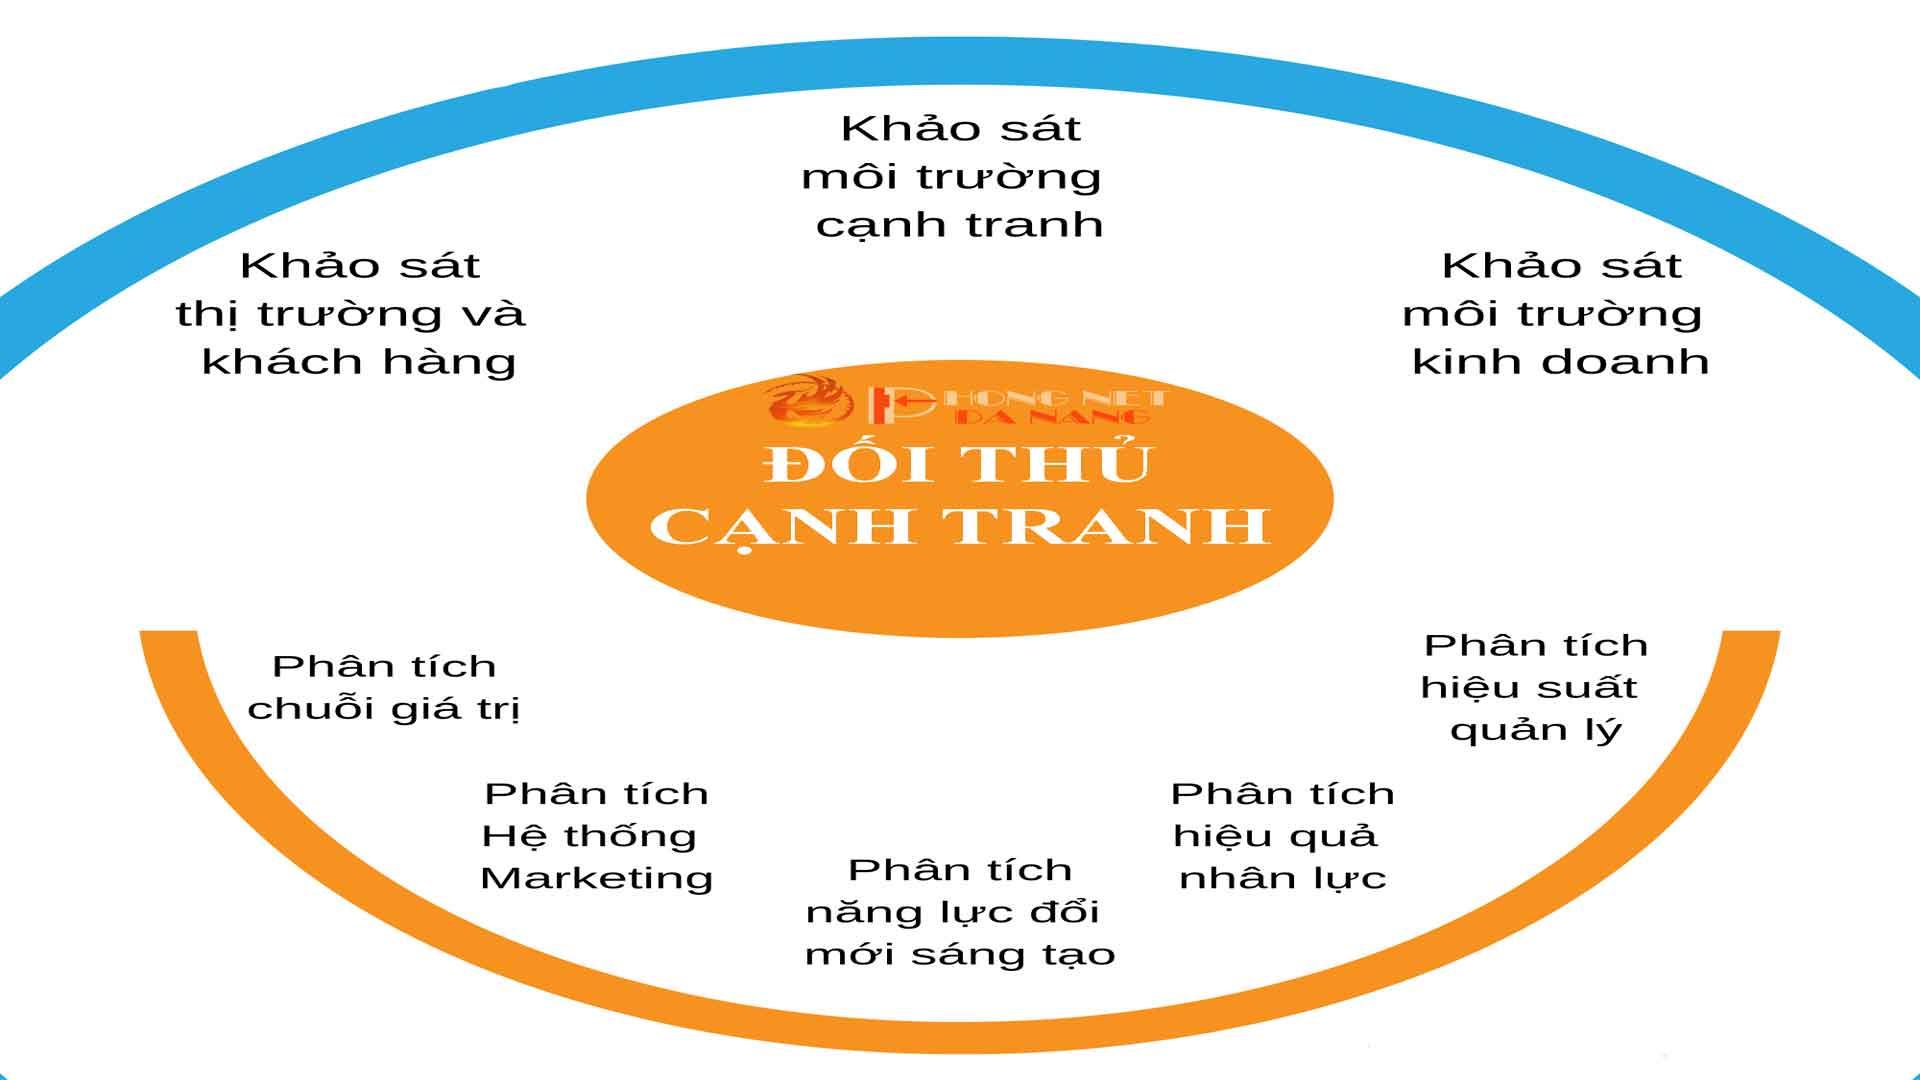 lap-dat-phong-net-tron-goi-tai-da-nang-phongnetdanang.com-18